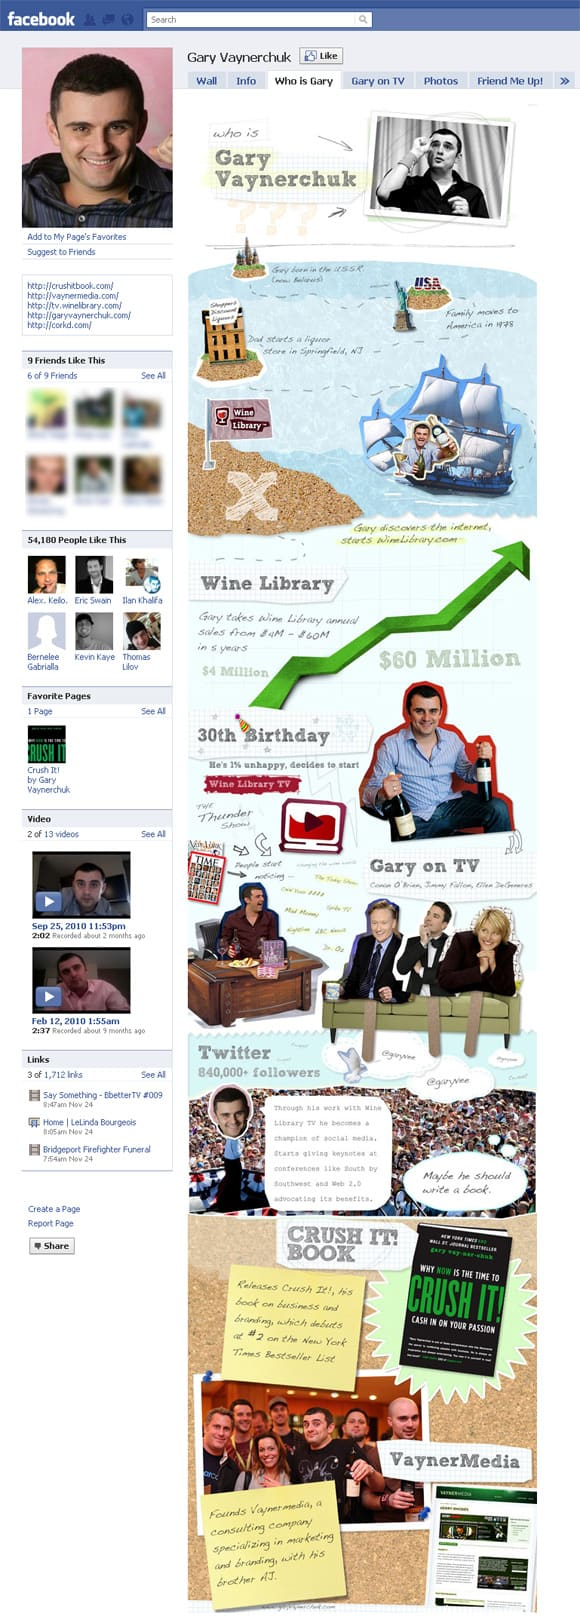 Gary Vaynerchuk Facebook Page